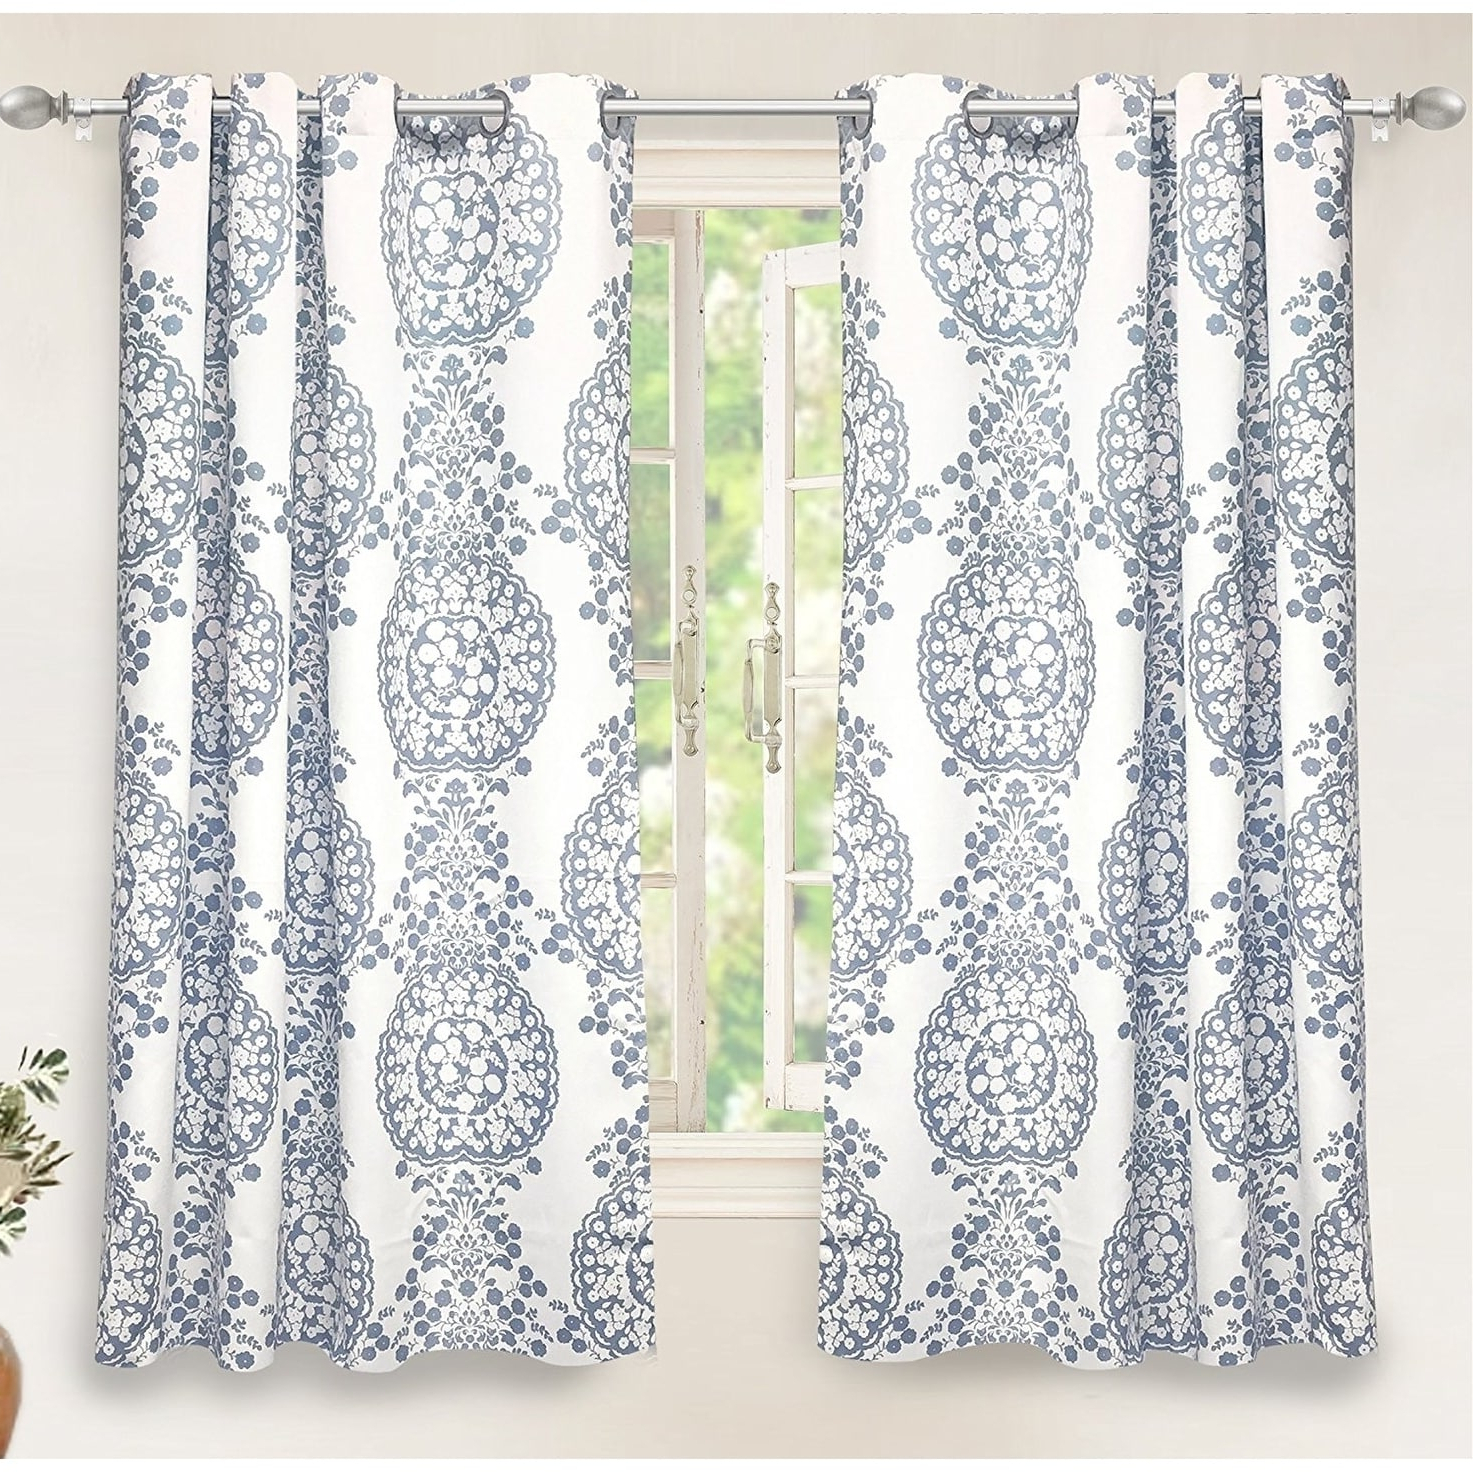 Well Liked Driftaway Samantha Thermal/room Darkening Window Curtain Pertaining To Pastel Damask Printed Room Darkening Grommet Window Curtain Panel Pairs (View 5 of 20)